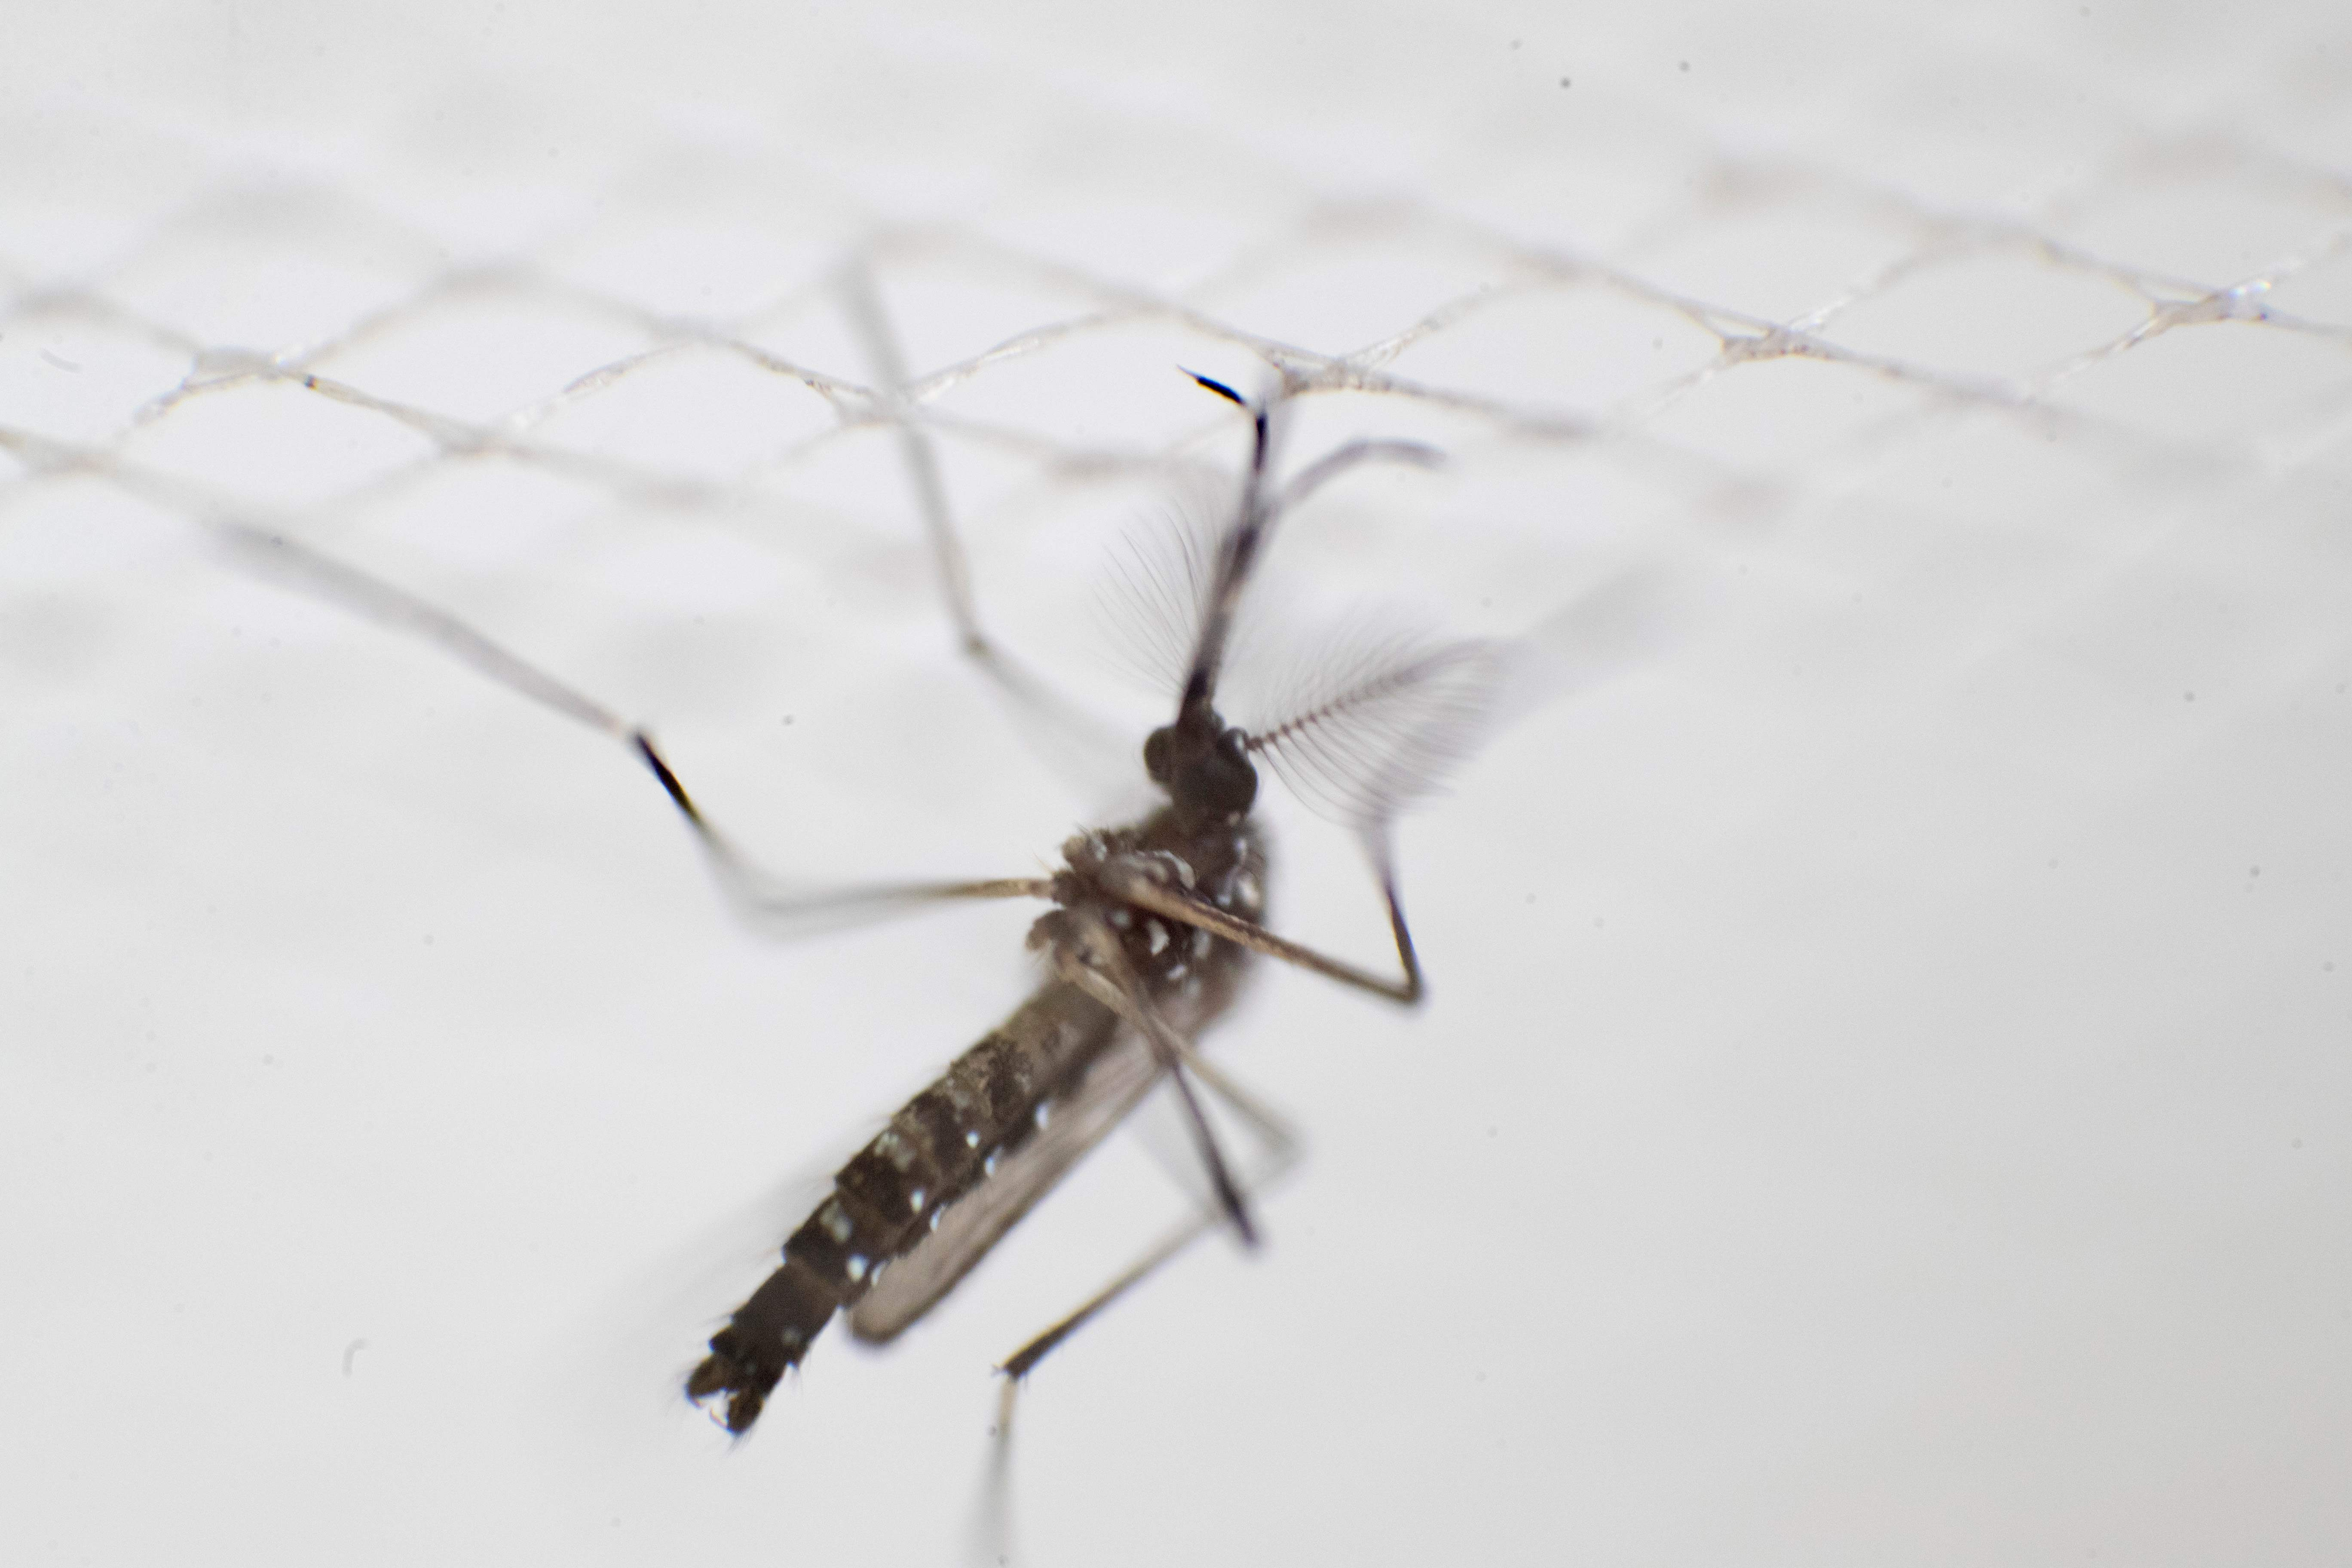 Medicina para combatir el dengue